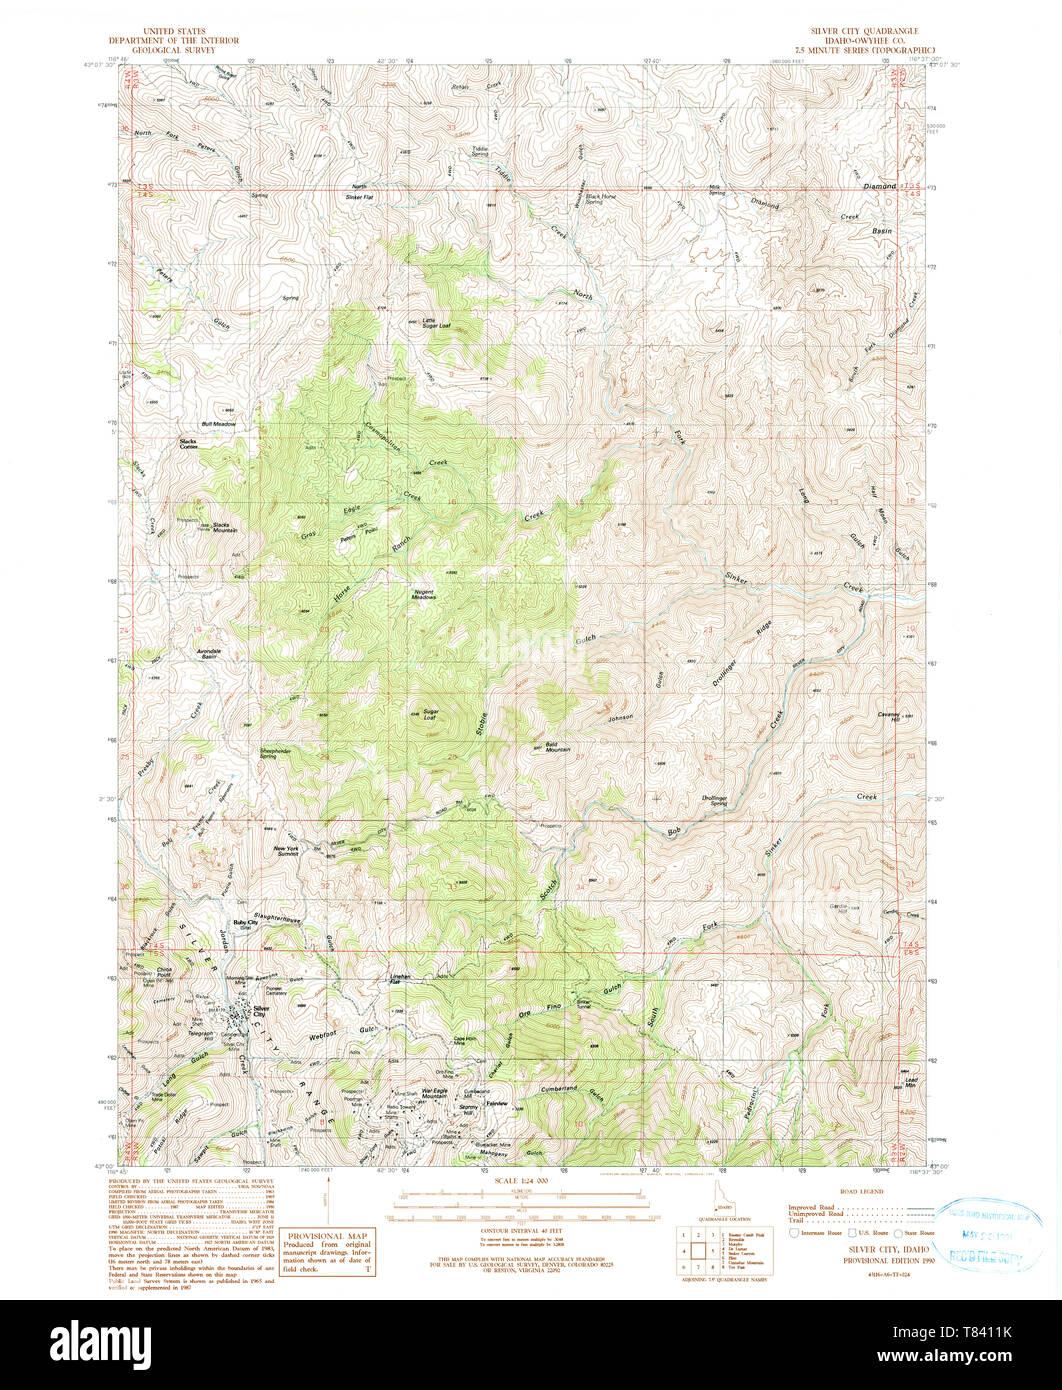 silver city idaho map Usgs Topo Map Idaho Id Silver City 238151 1990 24000 Restoration silver city idaho map